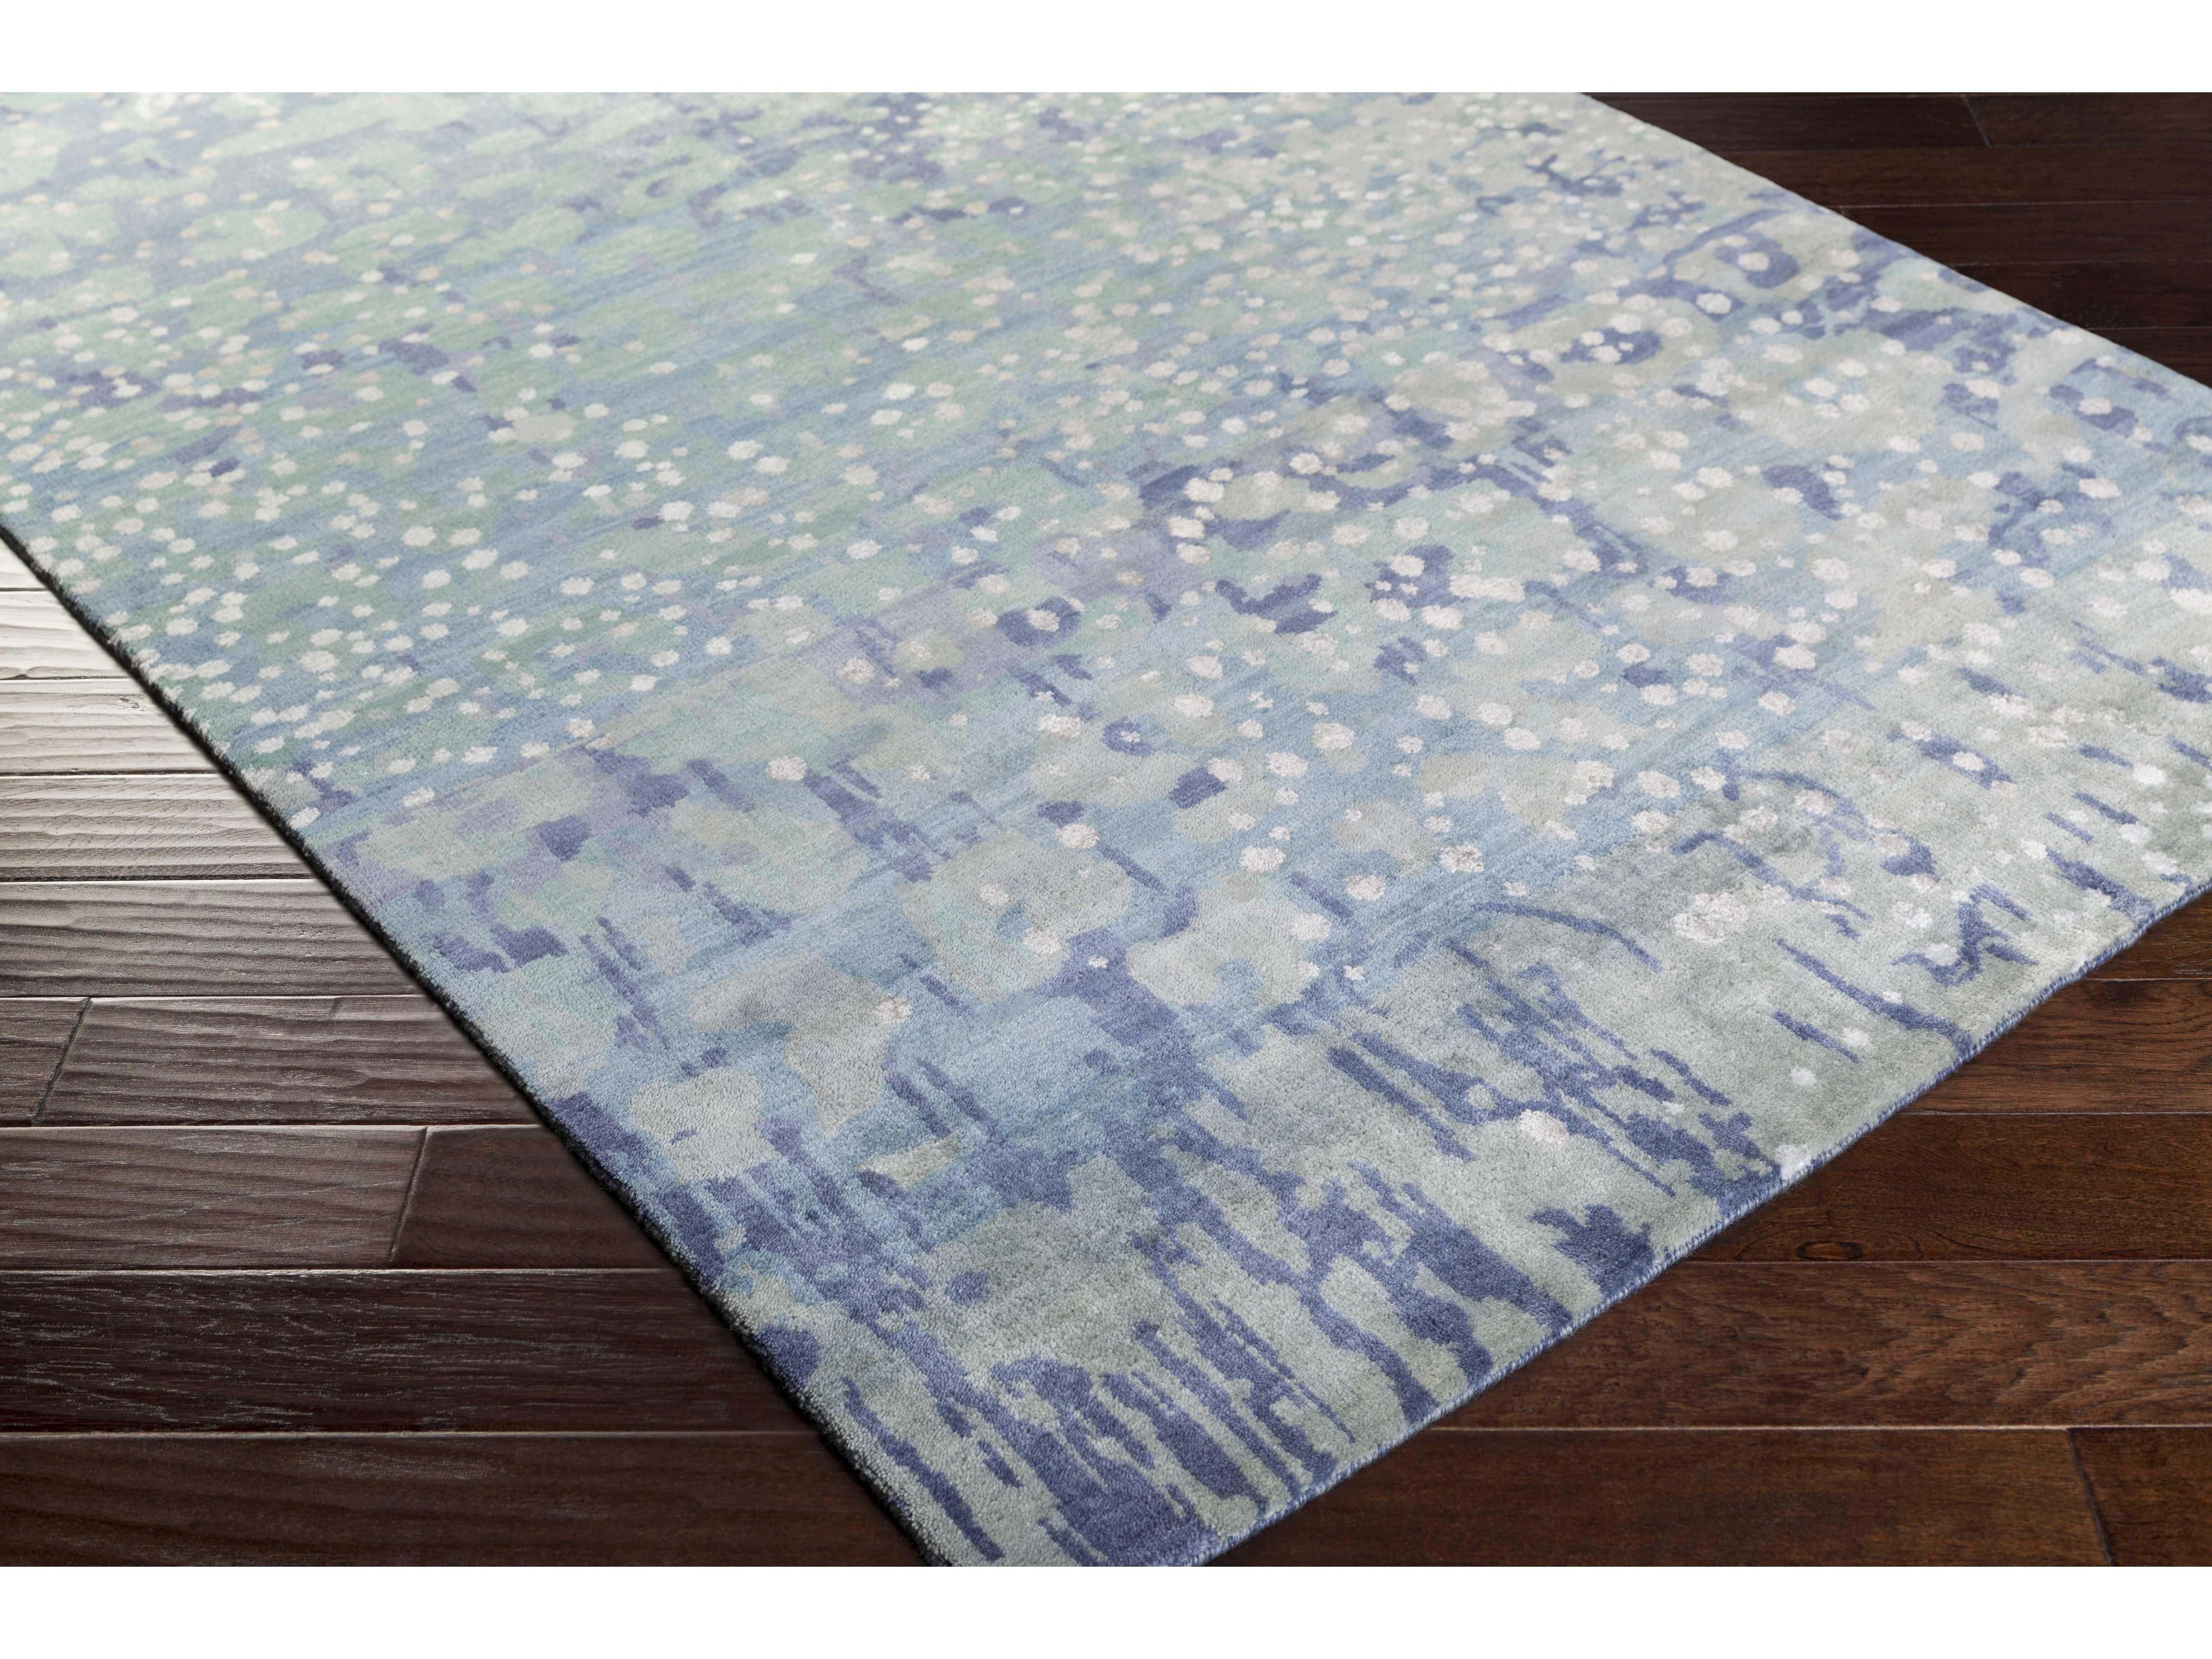 Surya Watercolor Rectangular Sea Foam Sky Blue Lime Area Rug In